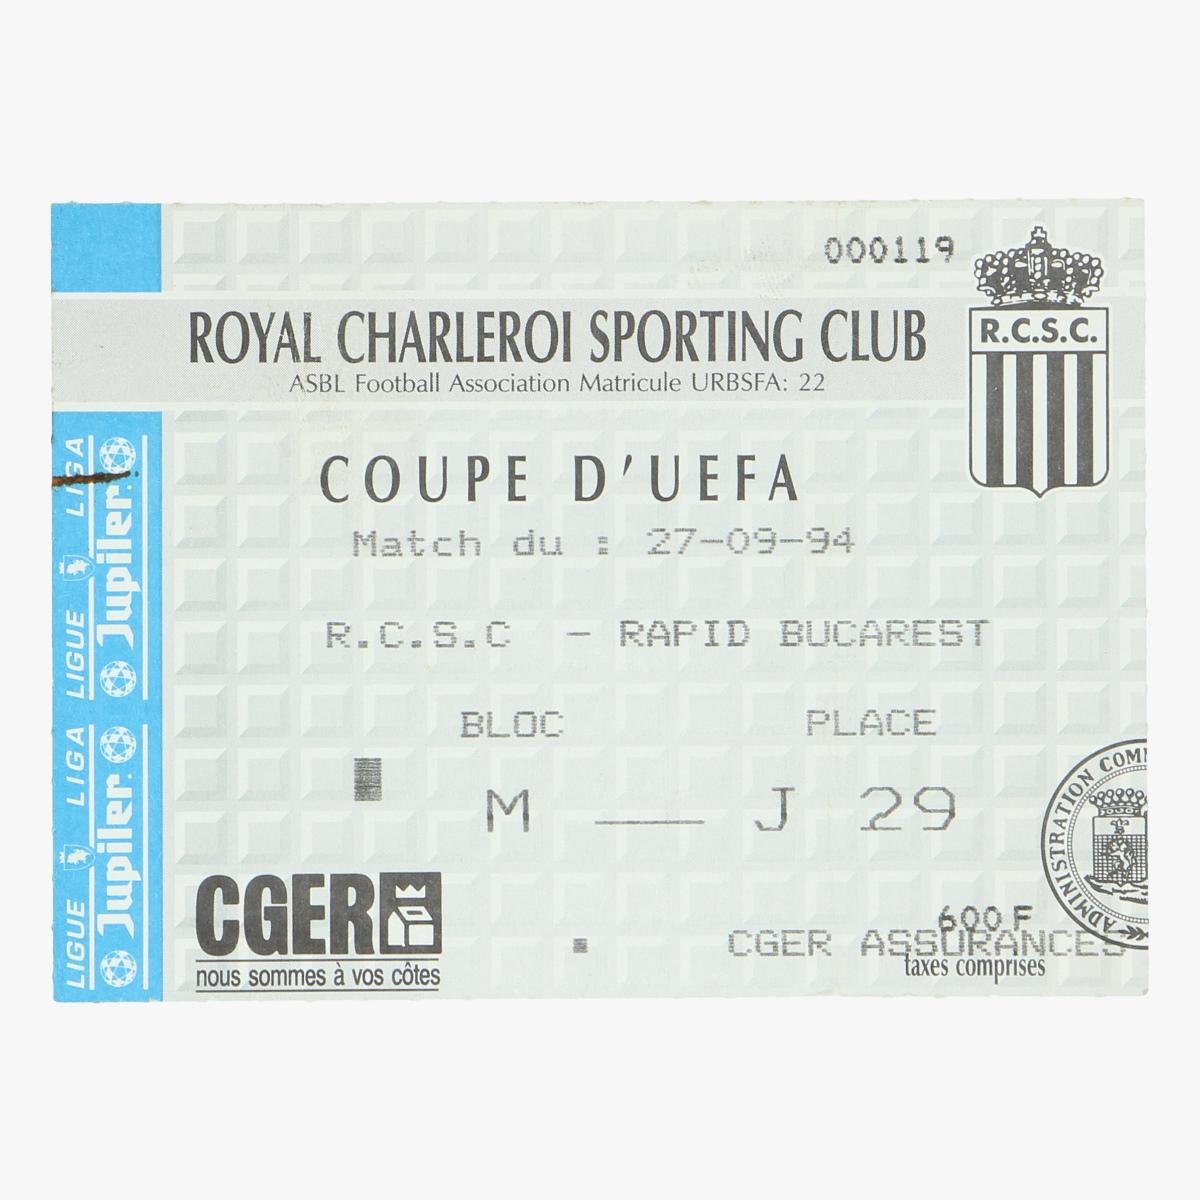 Afbeeldingen van voetbalticket royal charleroi sporting - bucarest coupe d' uefa